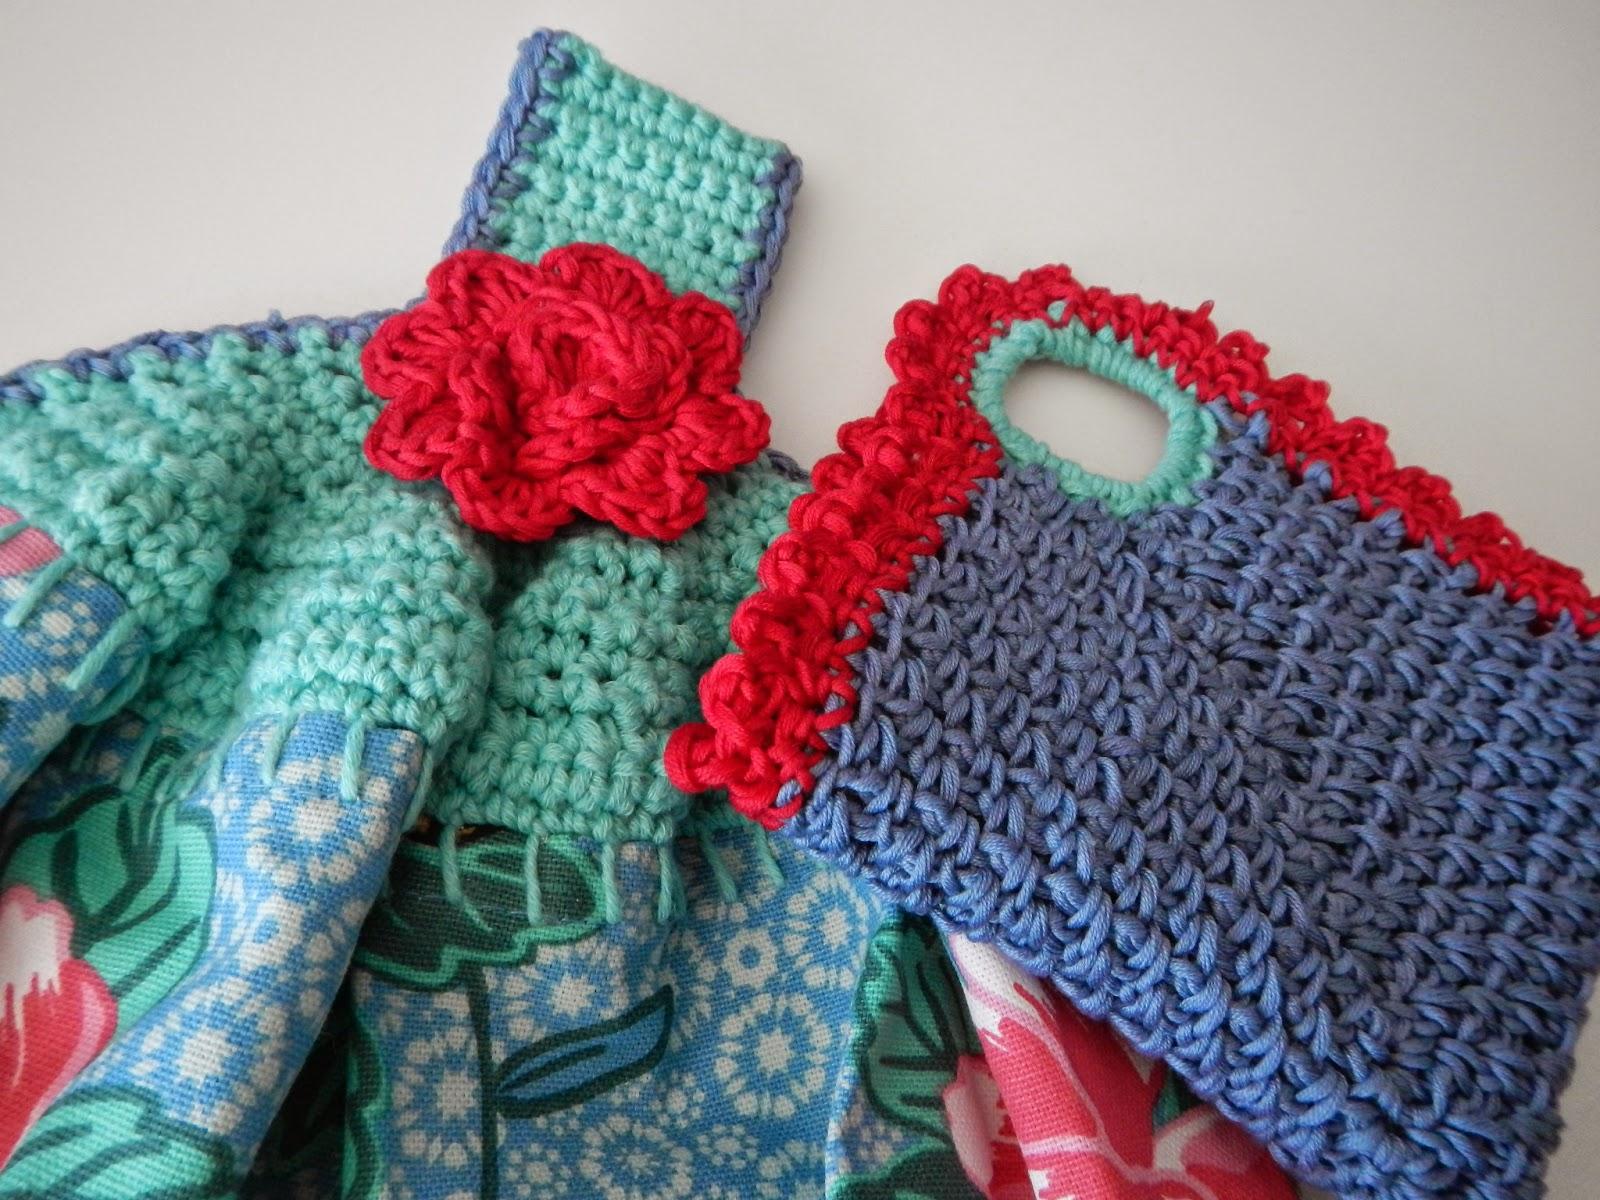 Apple Blossom Dreams: Linen Stitch Mitered Dish Cloth